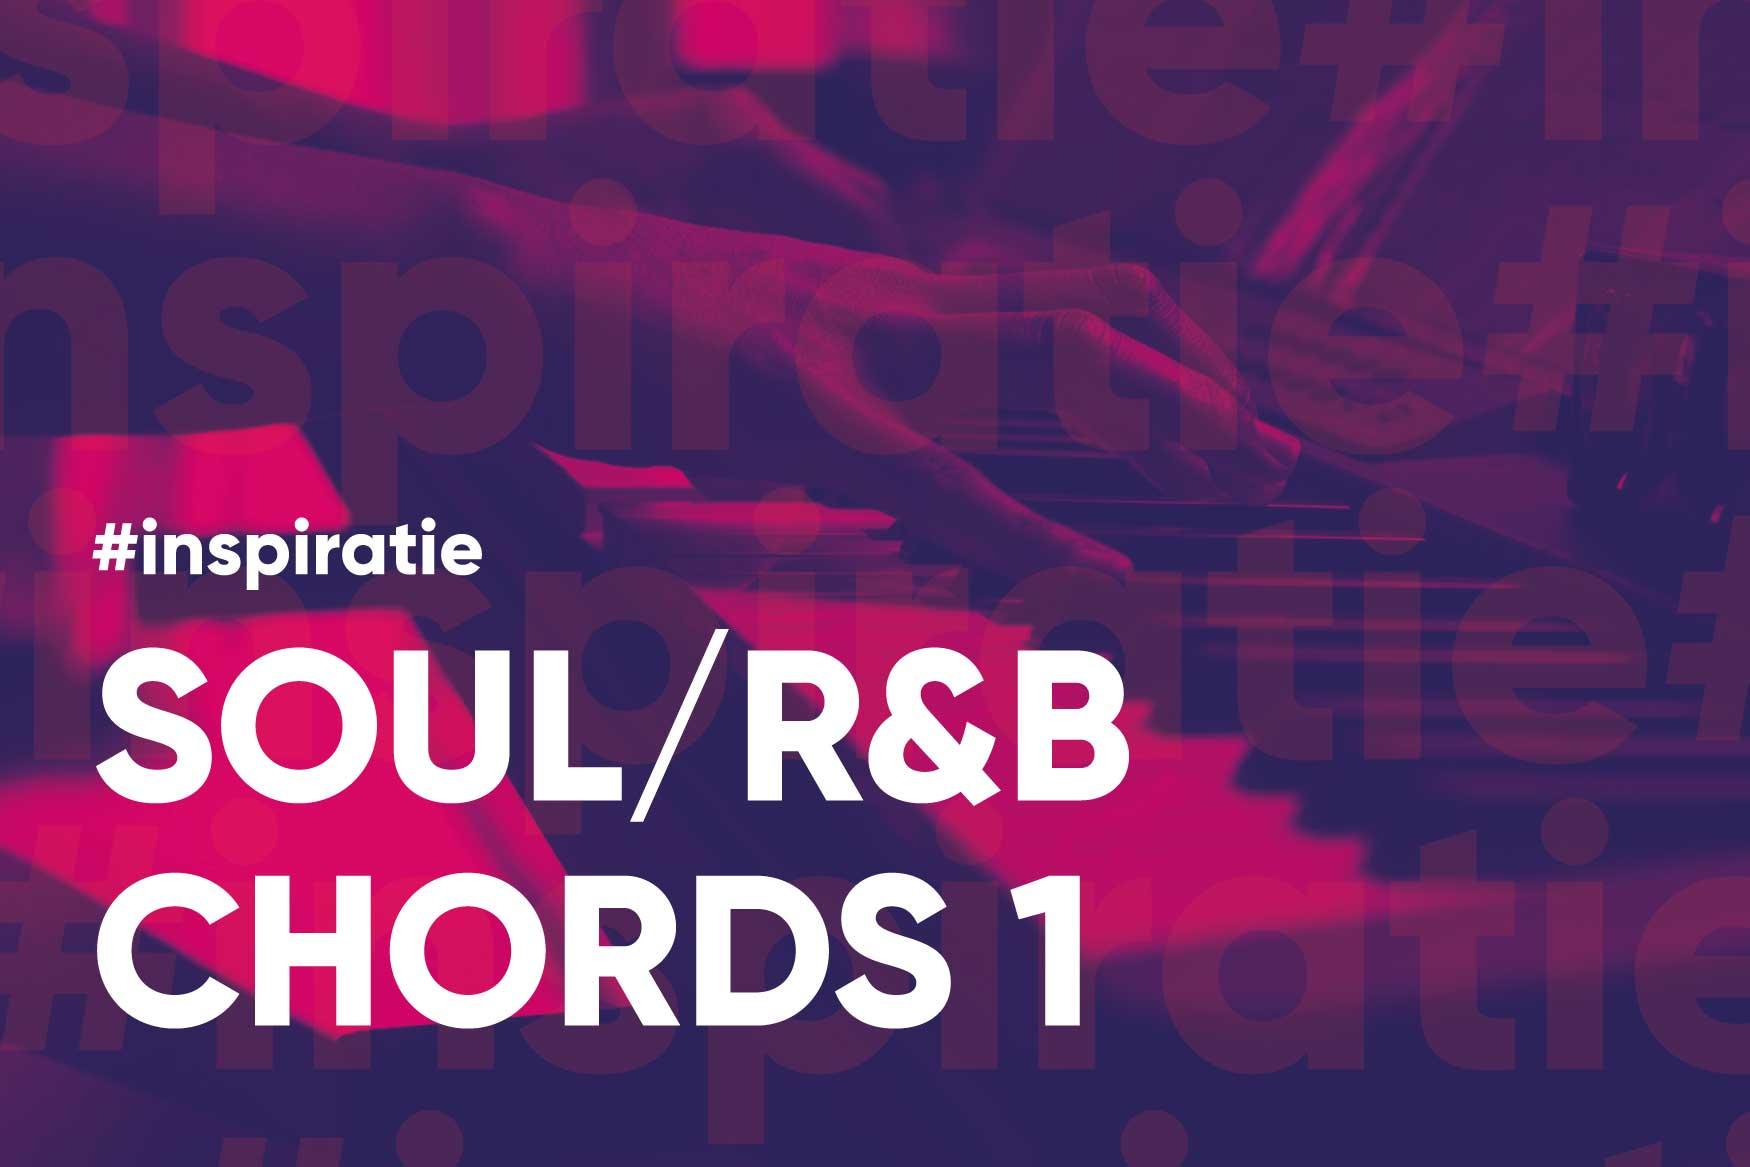 Amsterdamse Muziekschool Soul:R&B Chords